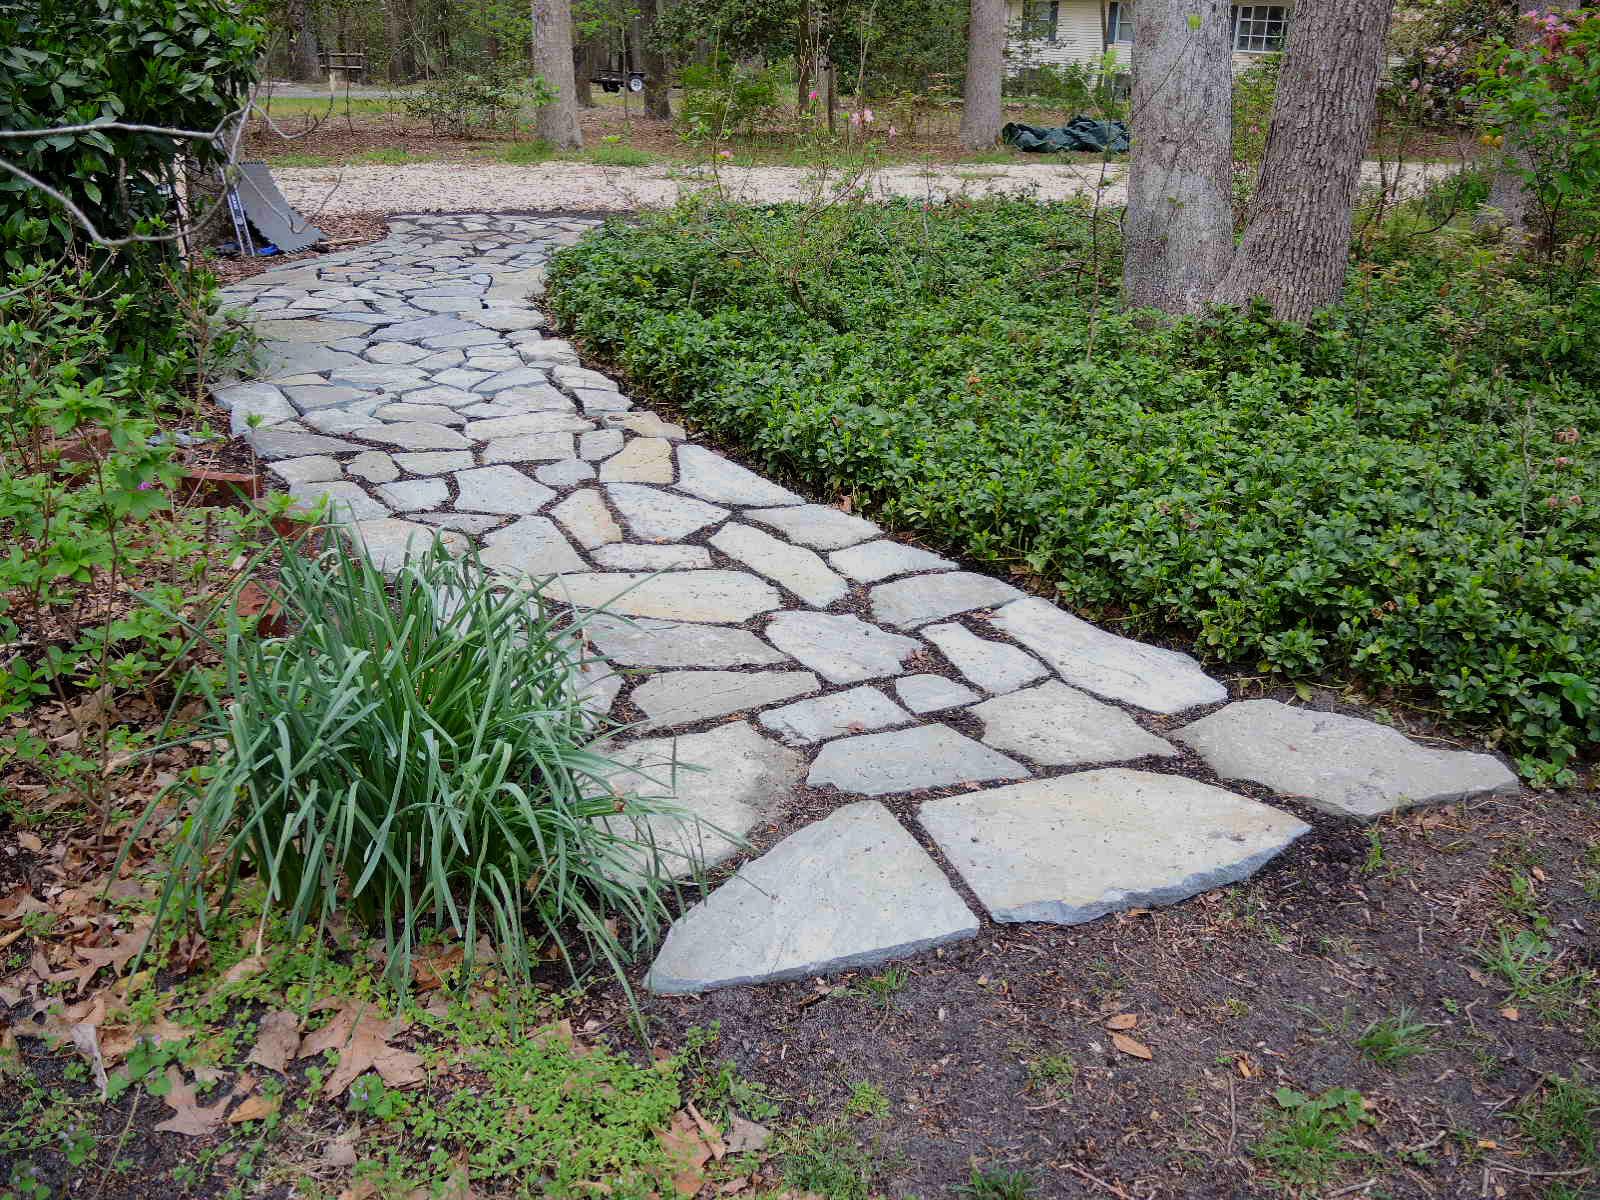 DSCN9868 - John's stone path.jpg